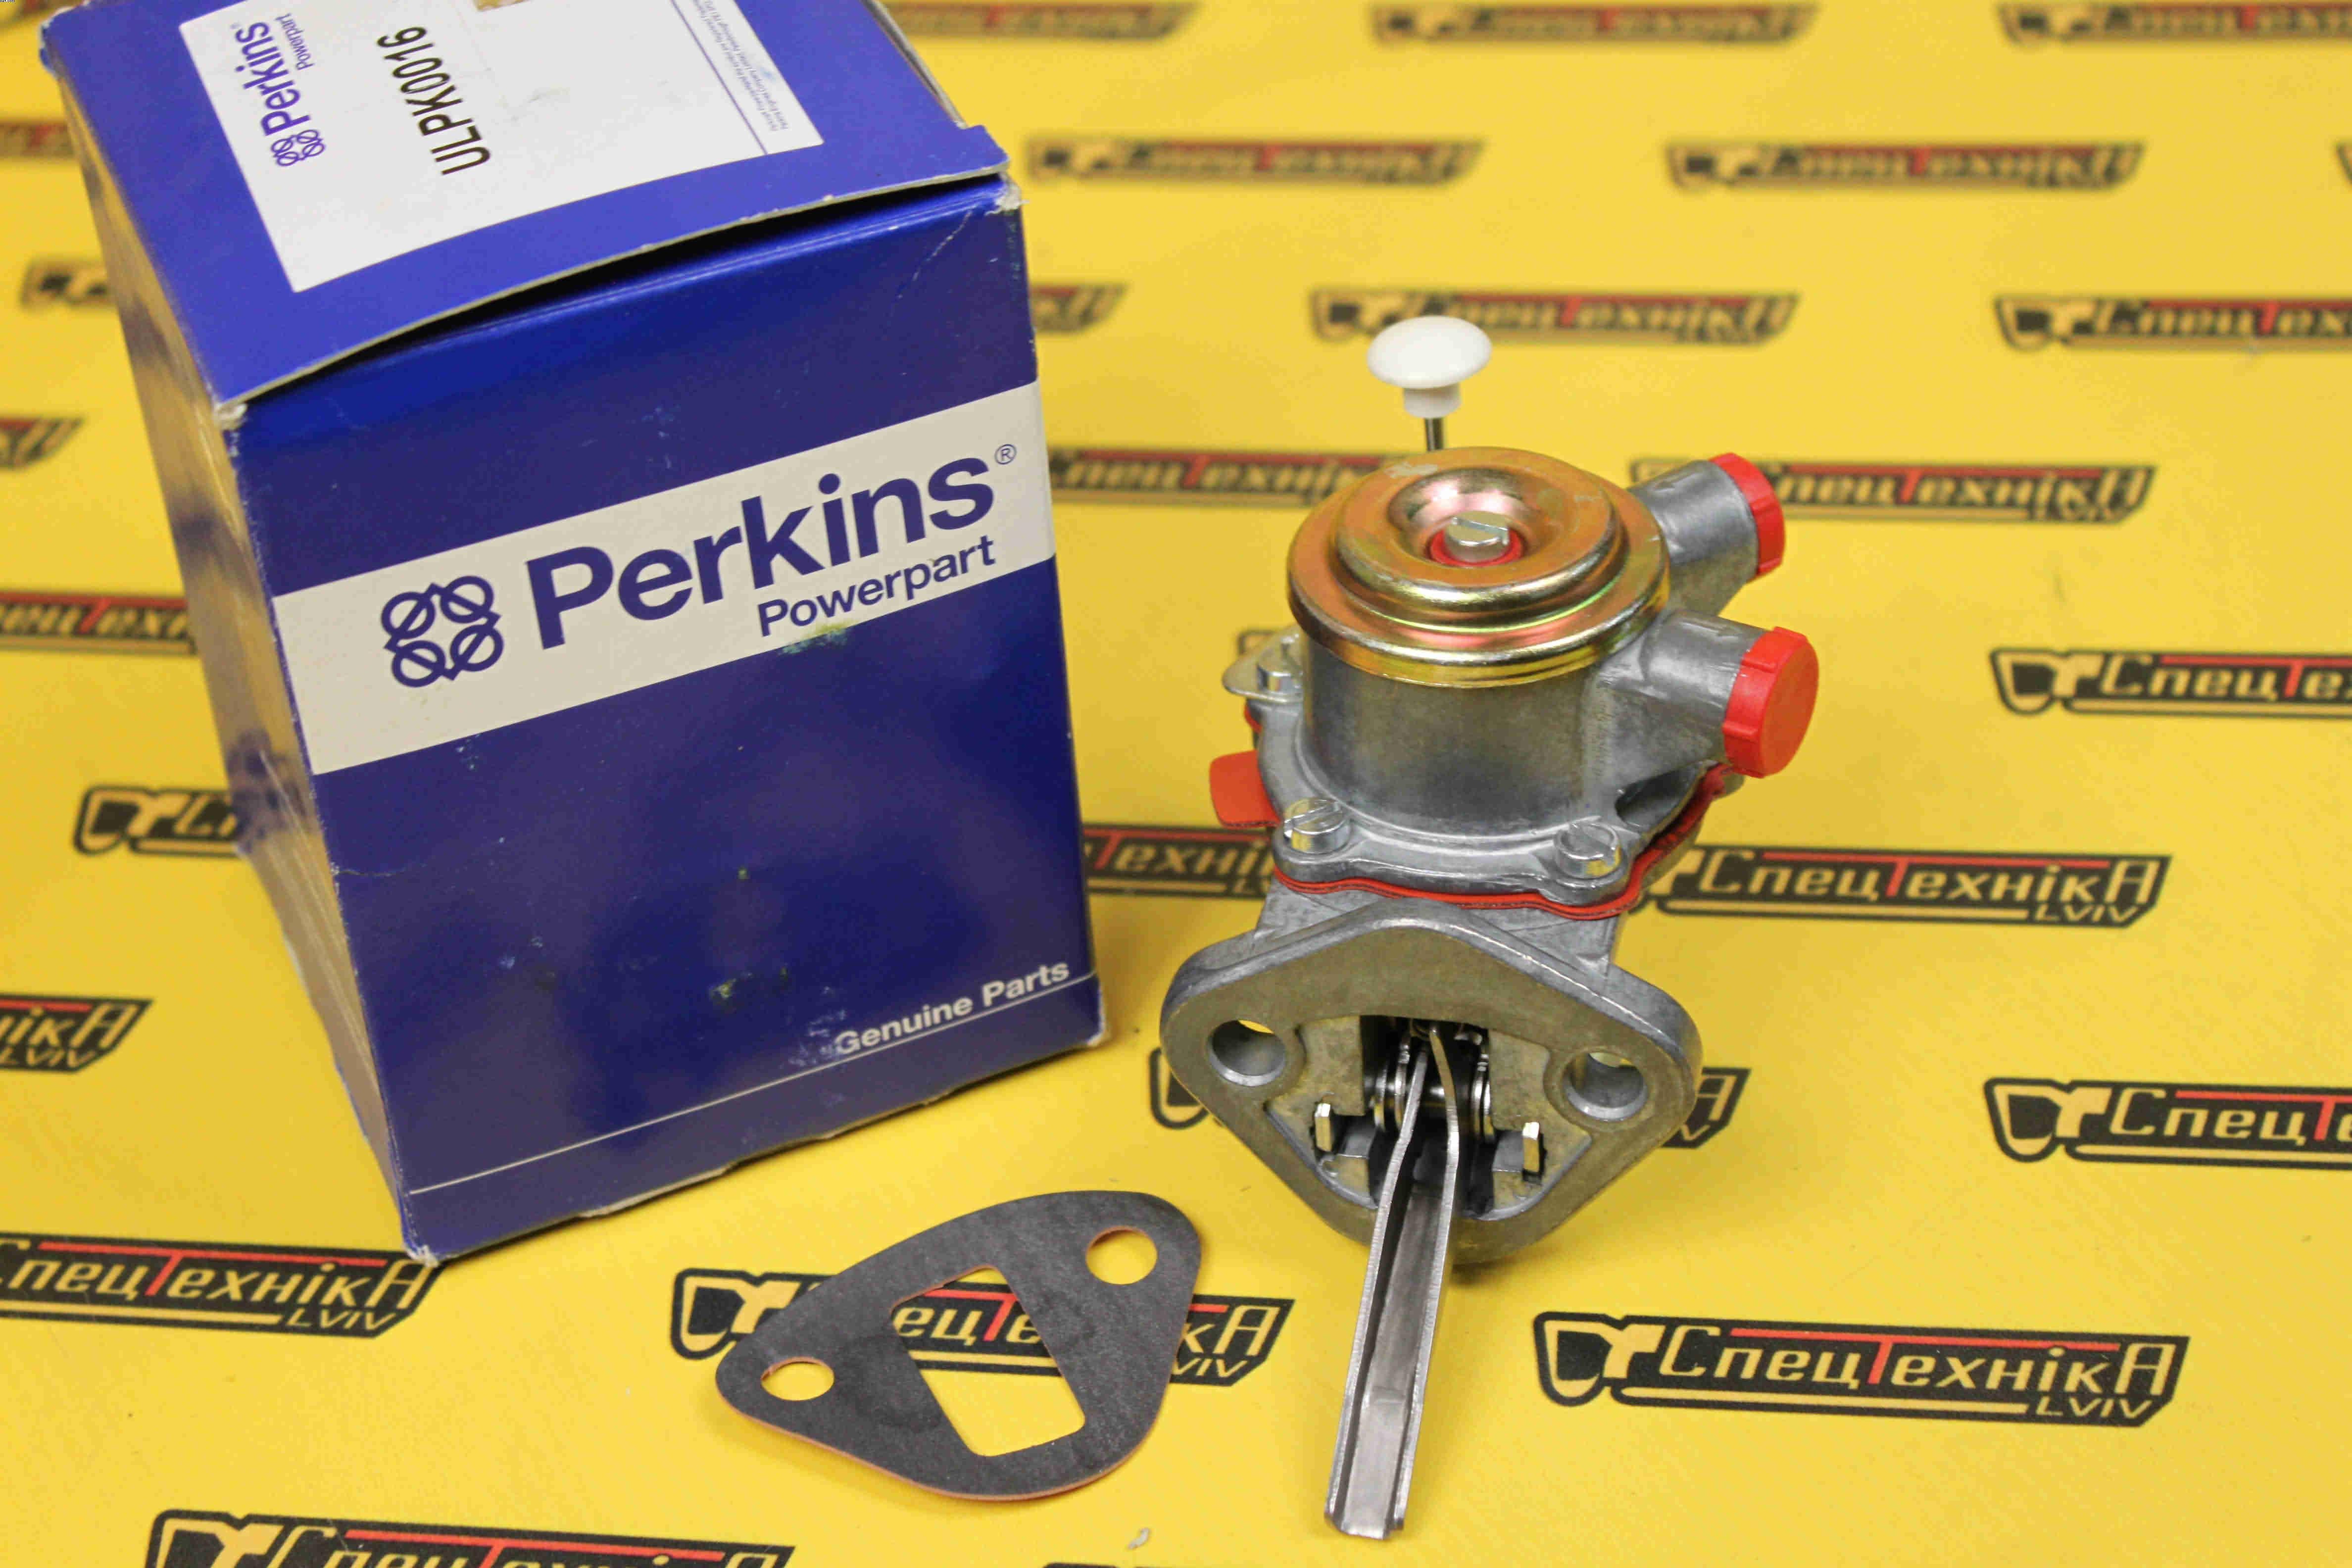 Топливний насос Perkins 500 Prima (ULPK0016) OEM